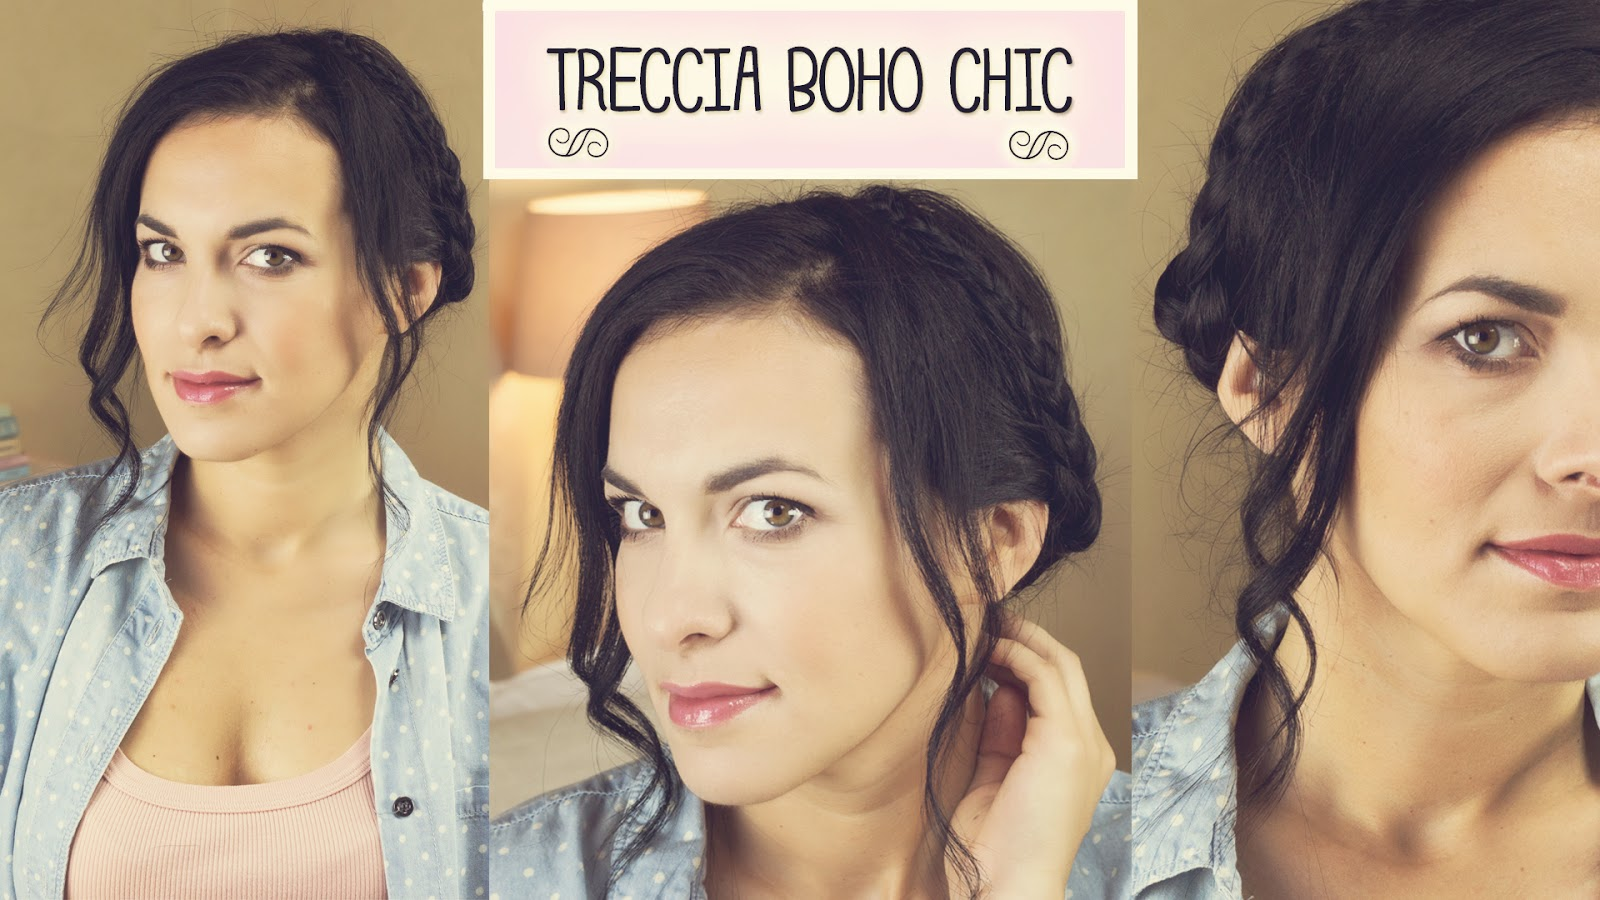 Treccia-Boho-Chic-BLOG